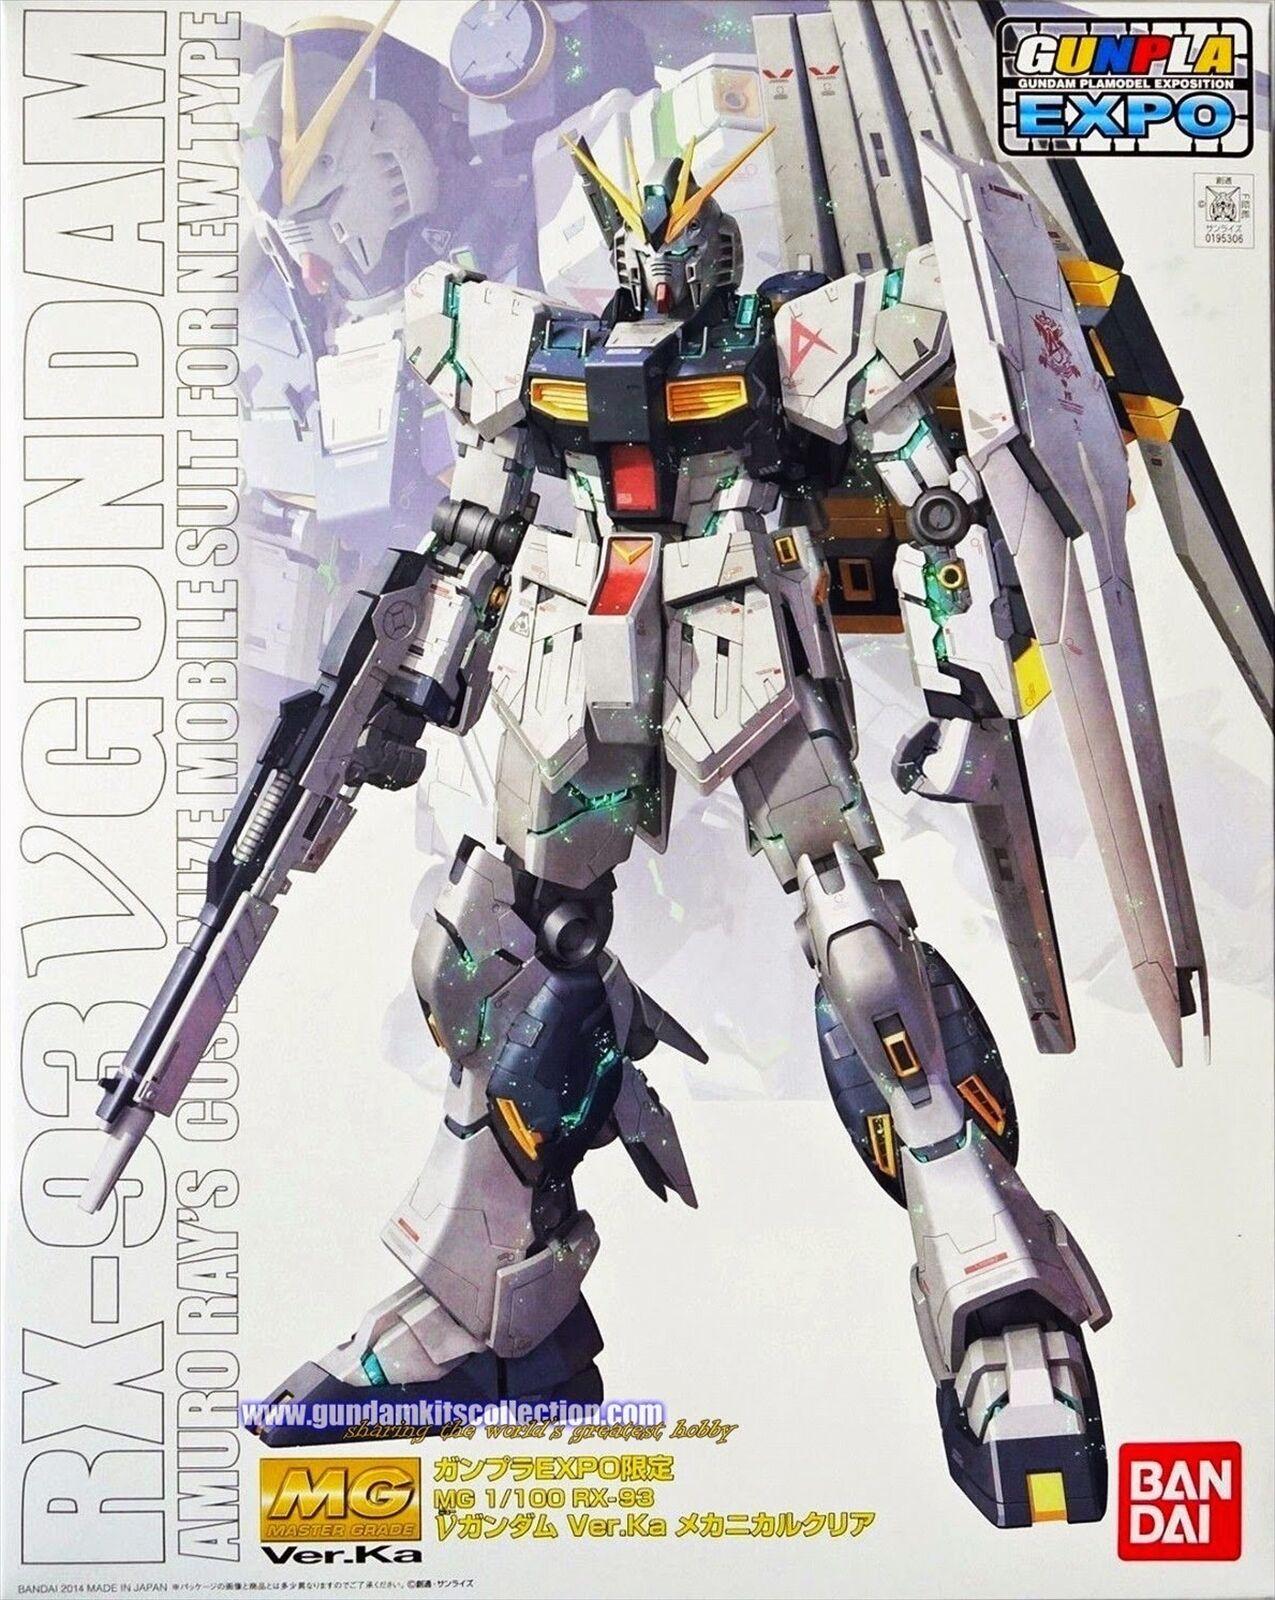 GUNLA EXPO 2014 begränsad MG 1  100 mot Gundam Ver.Ka Mechanical Clear